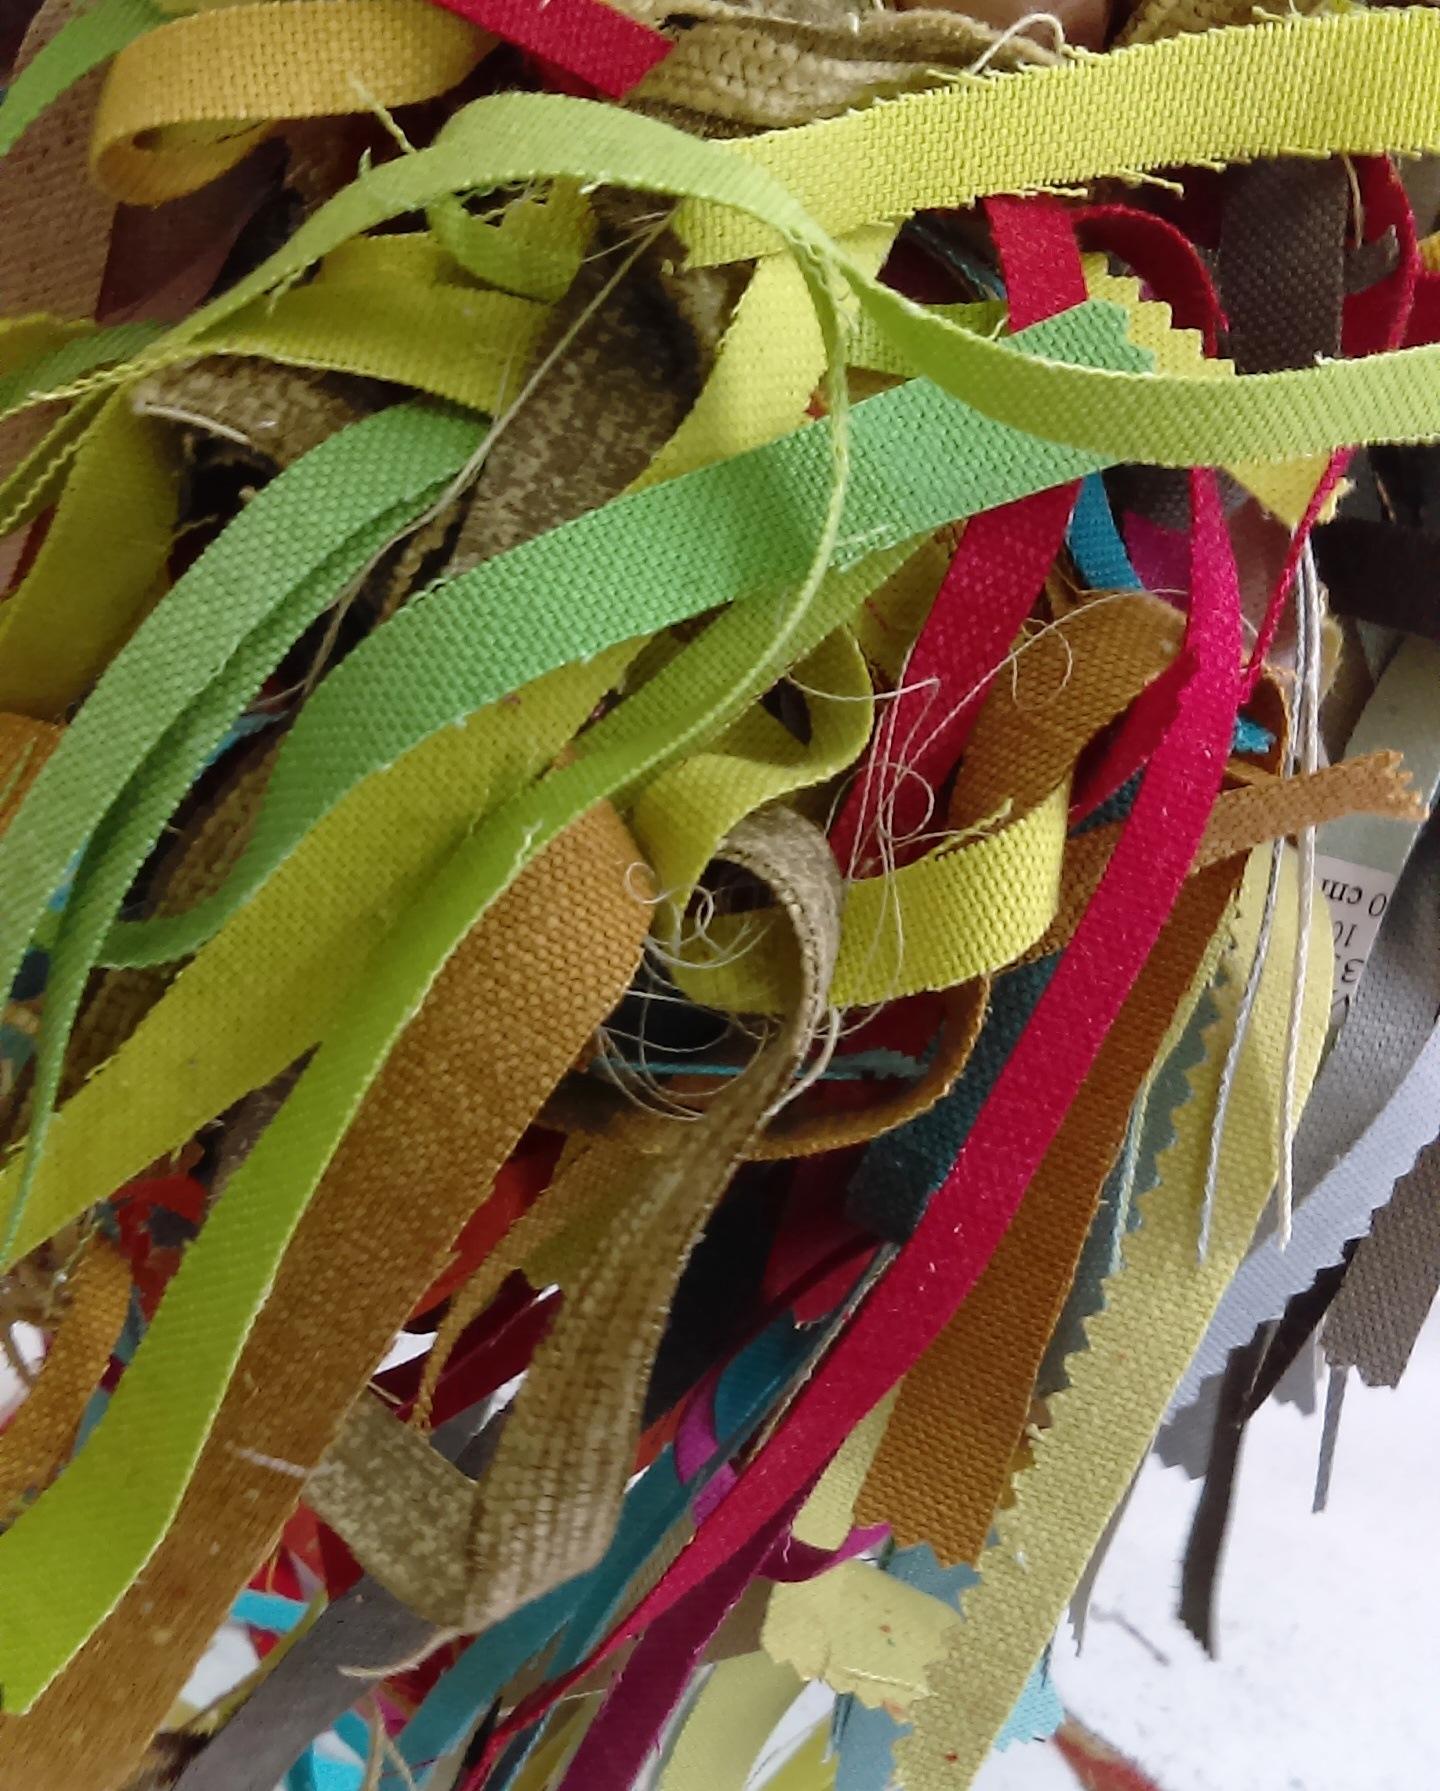 textiles by Platts